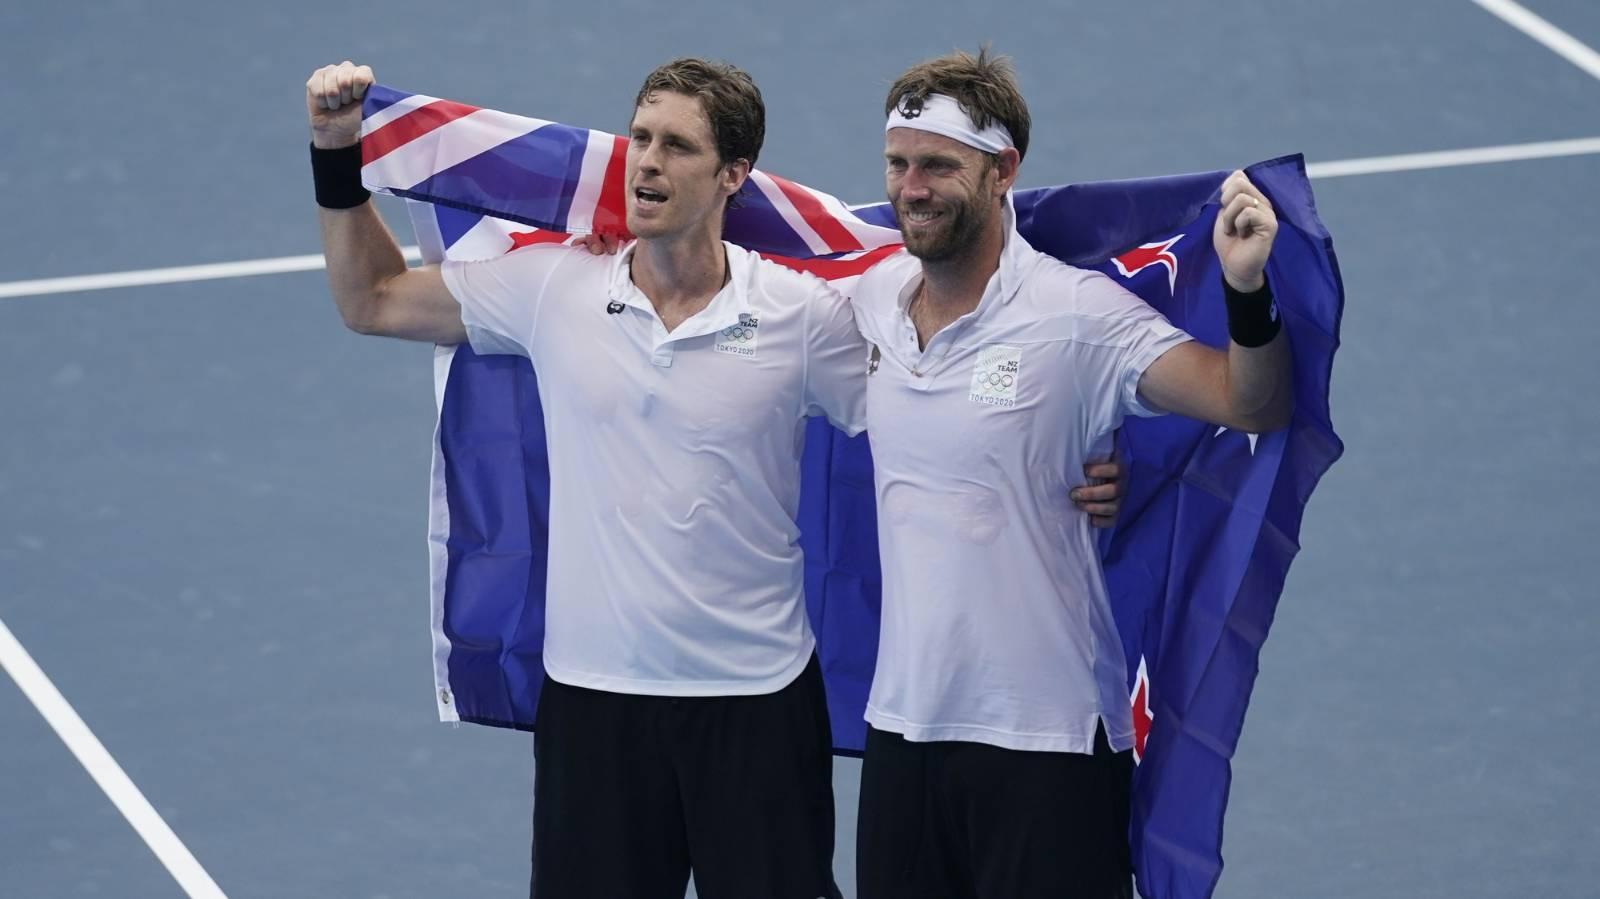 Venus reveals family sacrifices in bid for NZ's first tennis medal